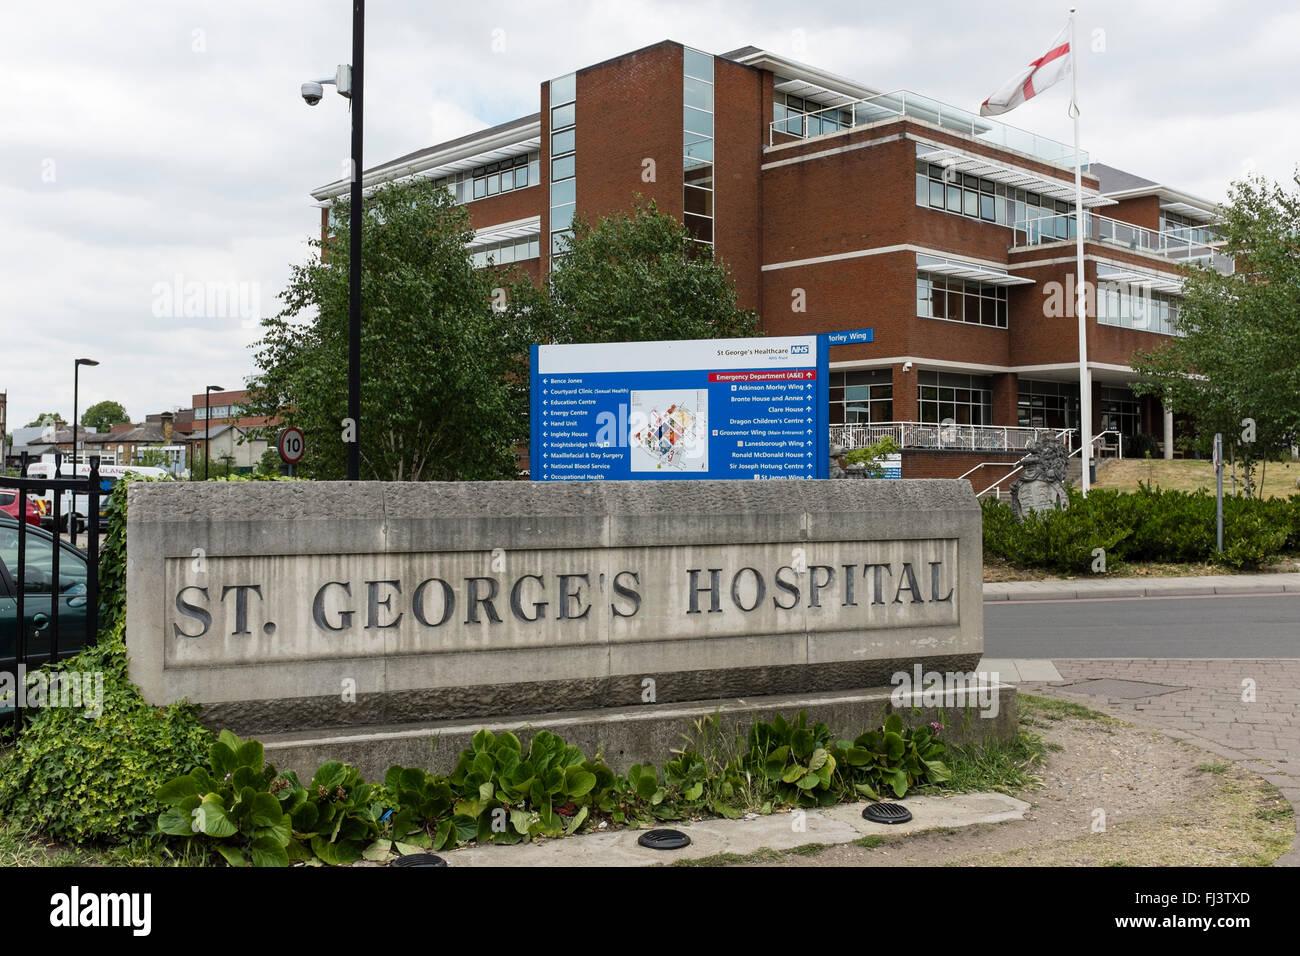 St George's Hospital, Tooting, London, UK Stock Photo